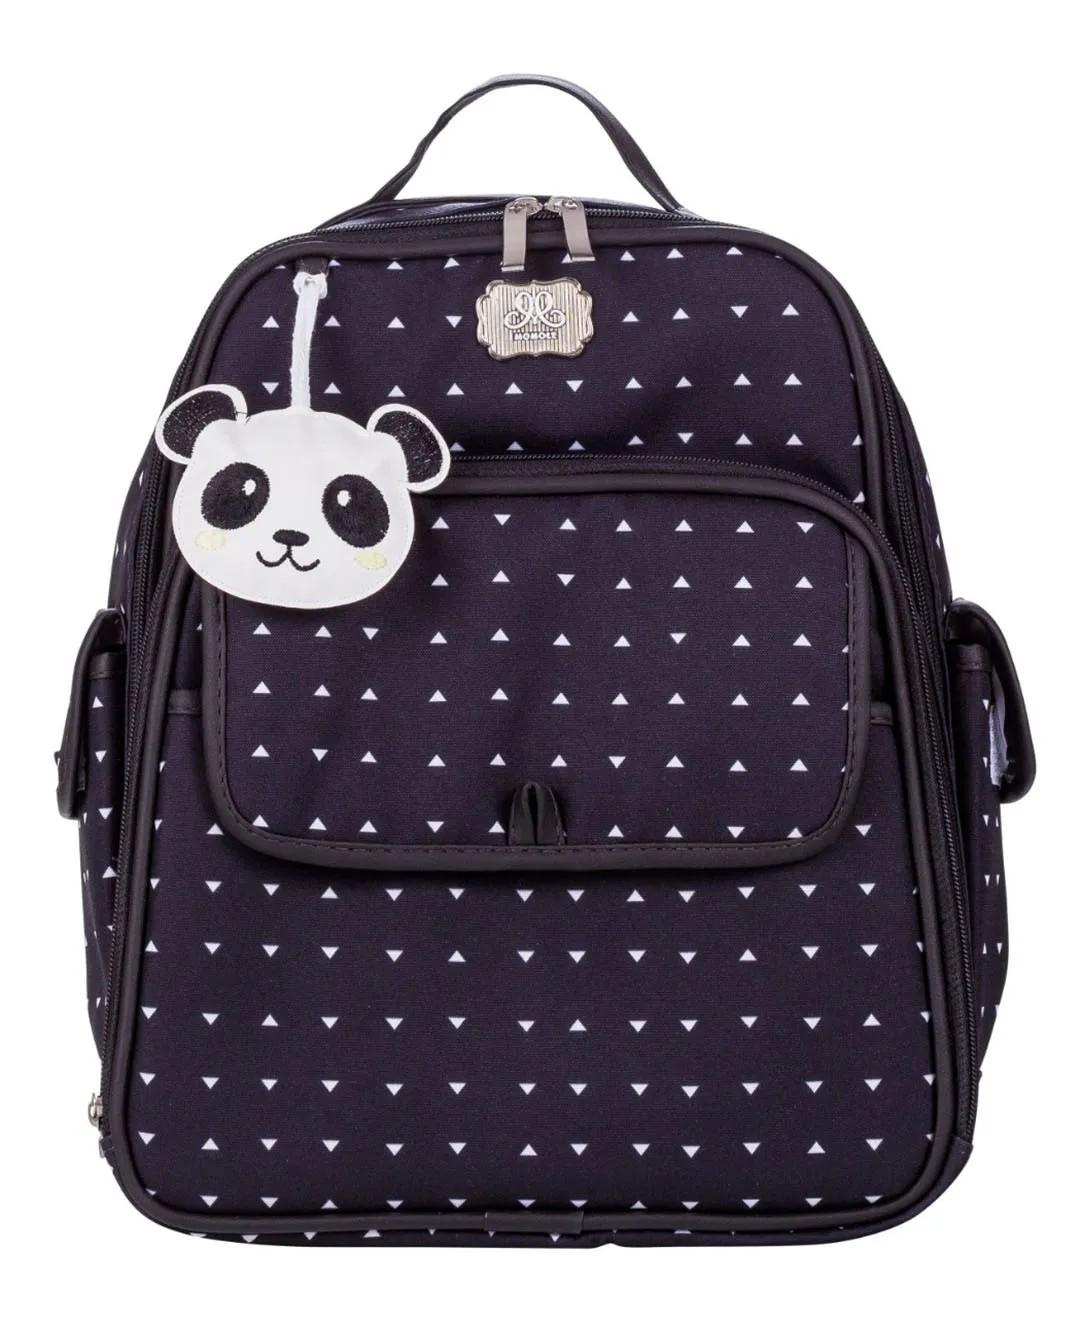 Mochila Maternidade Térmica Panda Preto Momole